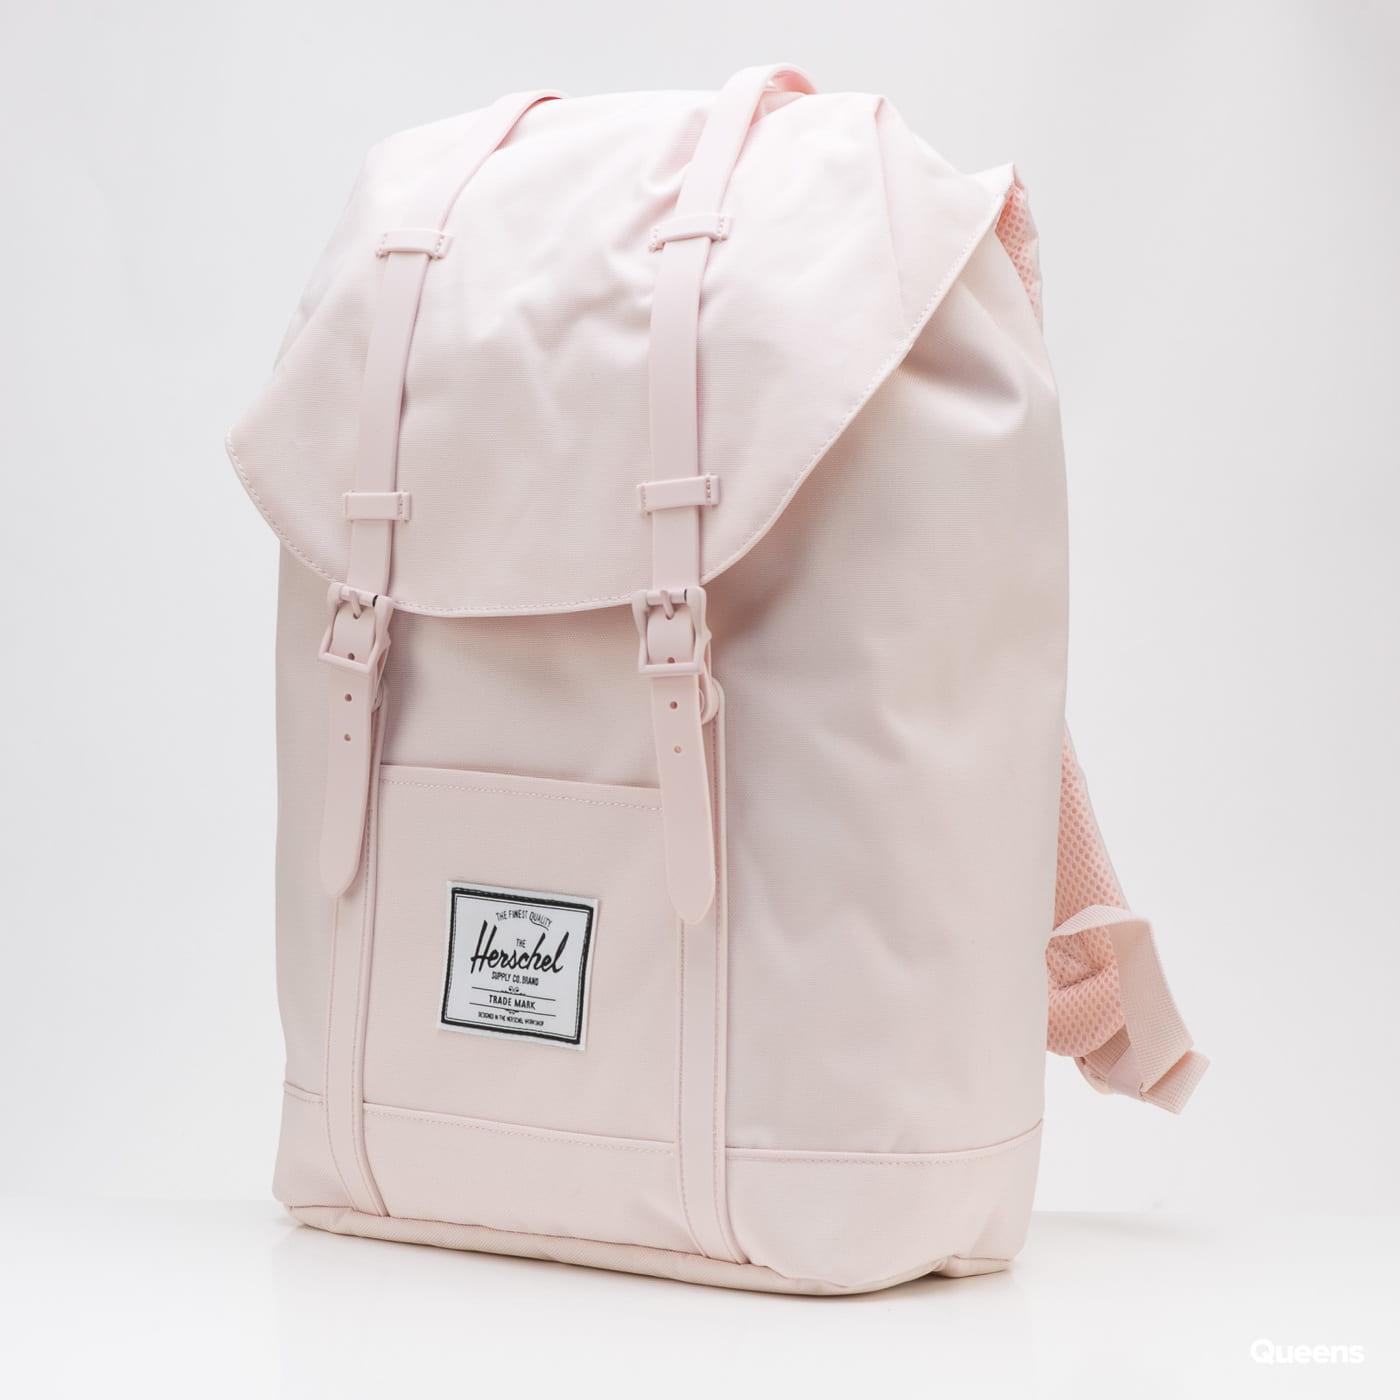 The Herschel Supply CO. Retreat Backpack light pink